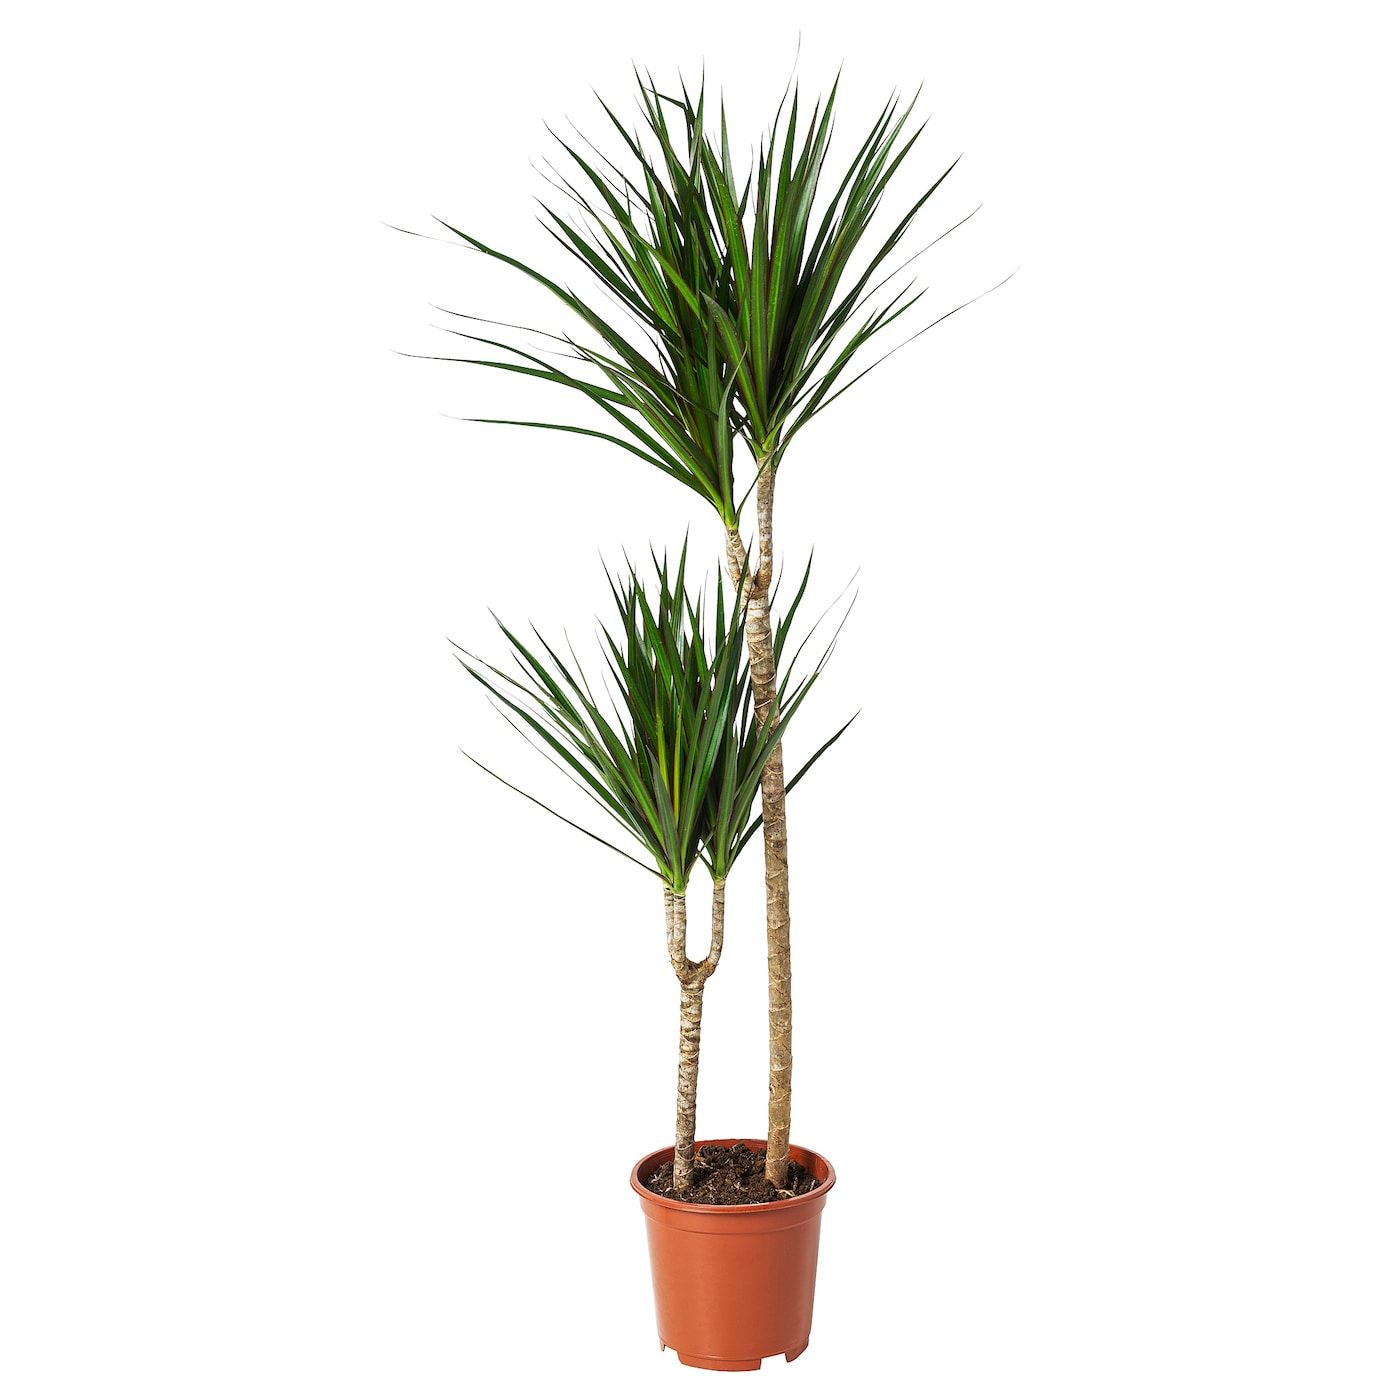 Dracaena Marginata Pflanze Drachenbaum 2 Stamme 19 Cm Ikea Osterreich Potplanten Planten Kunstplanten